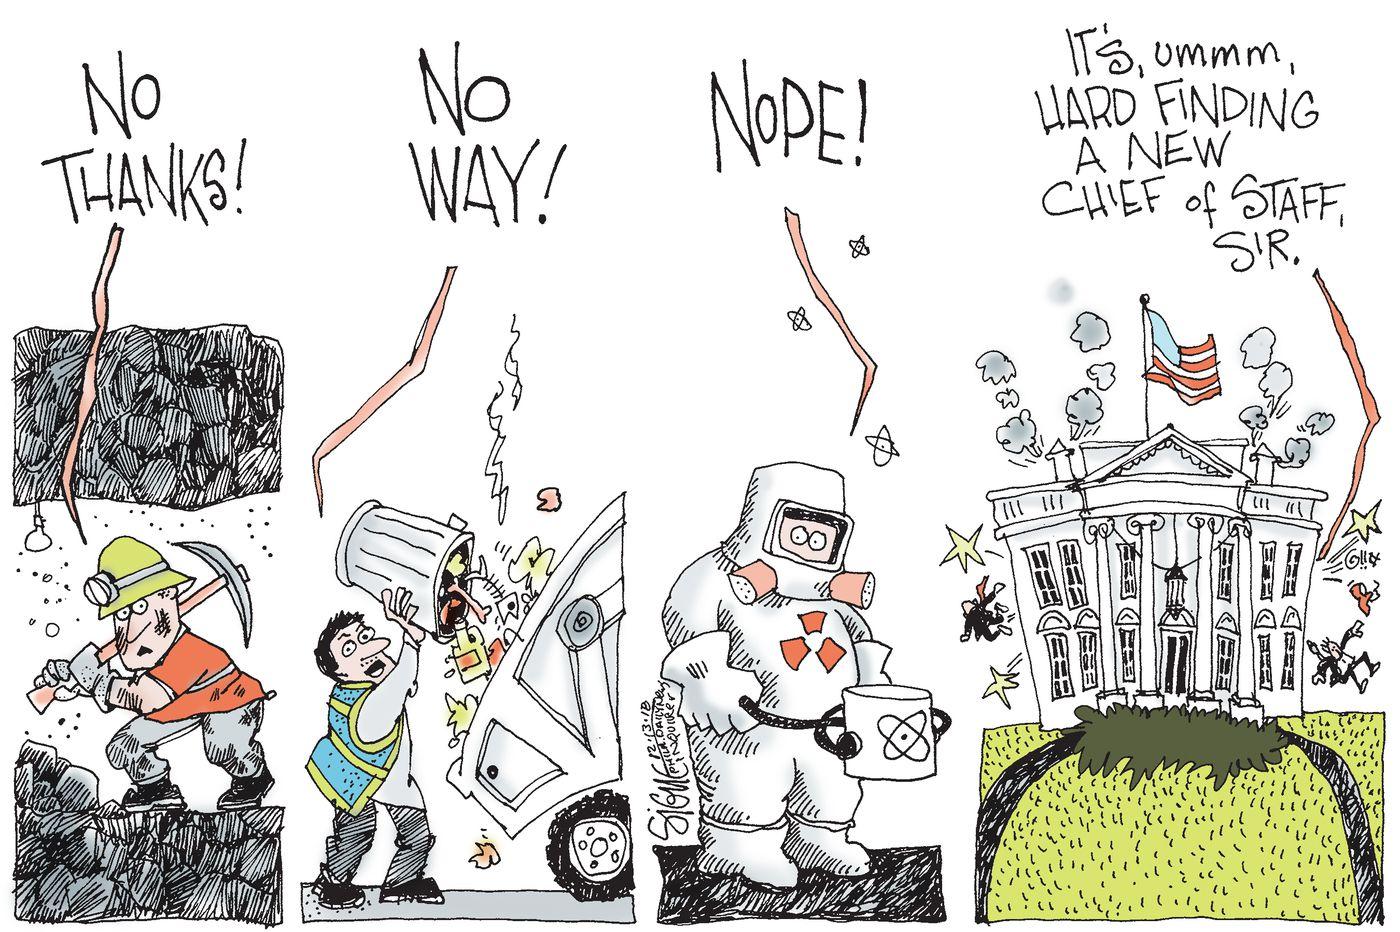 Trump Chief of Staff Hiring Complications